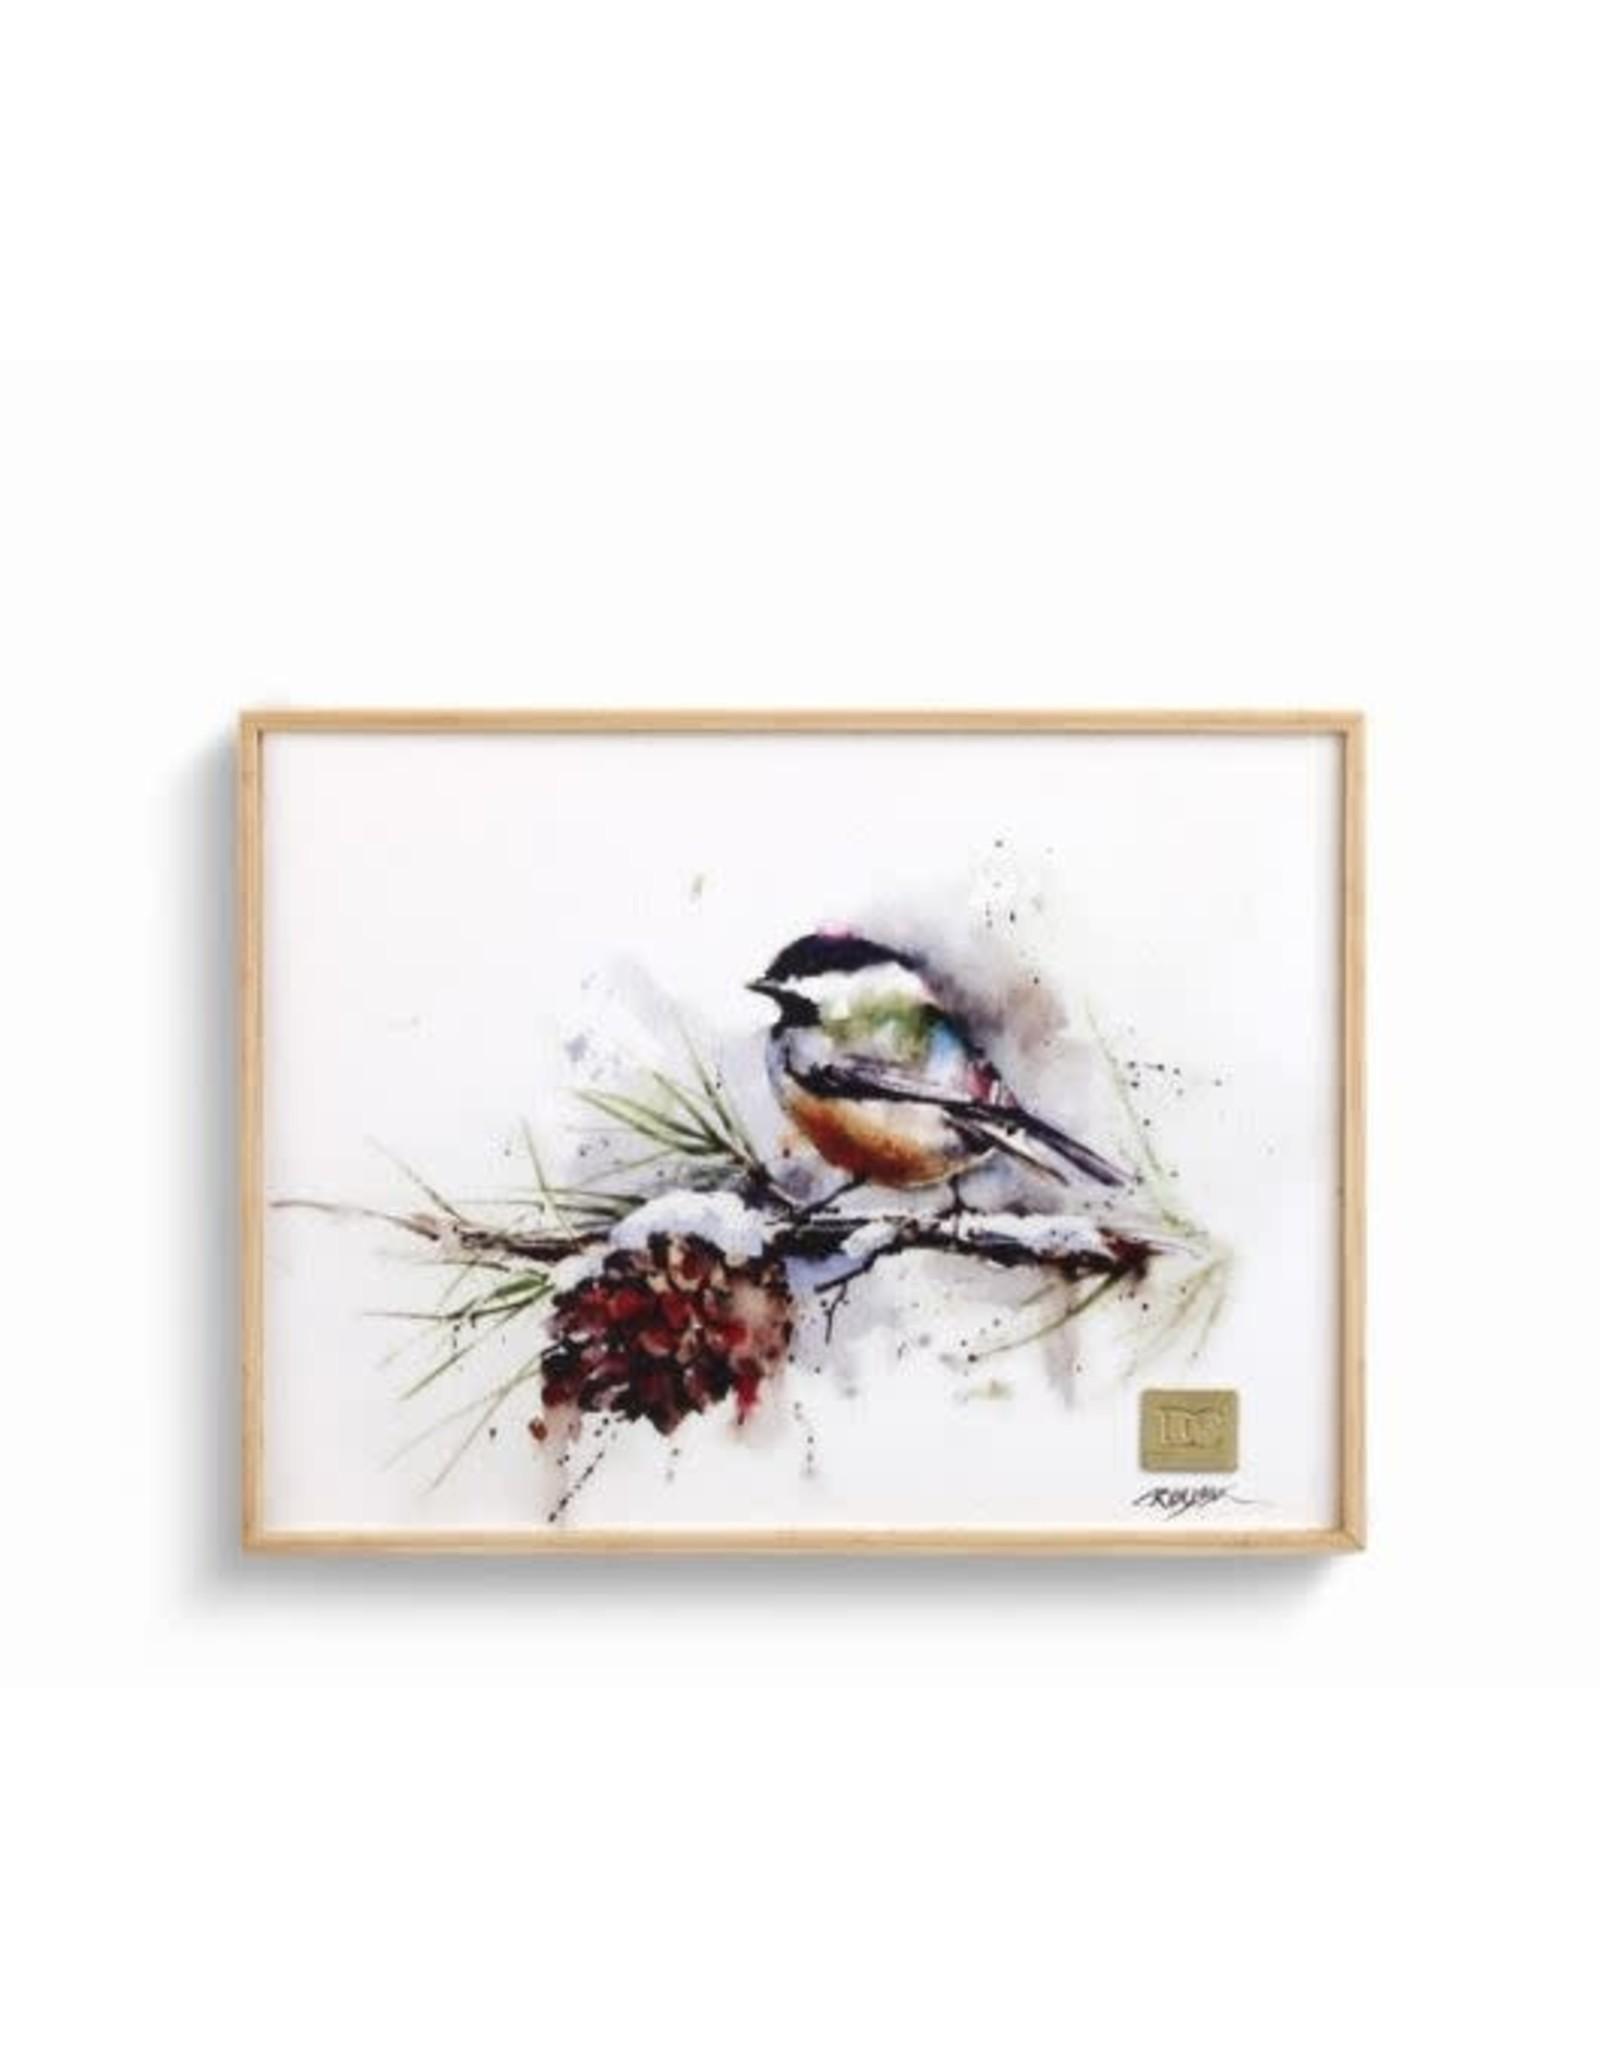 Demdaco CHICKADEE AND PINECONE WALL ART 6X8